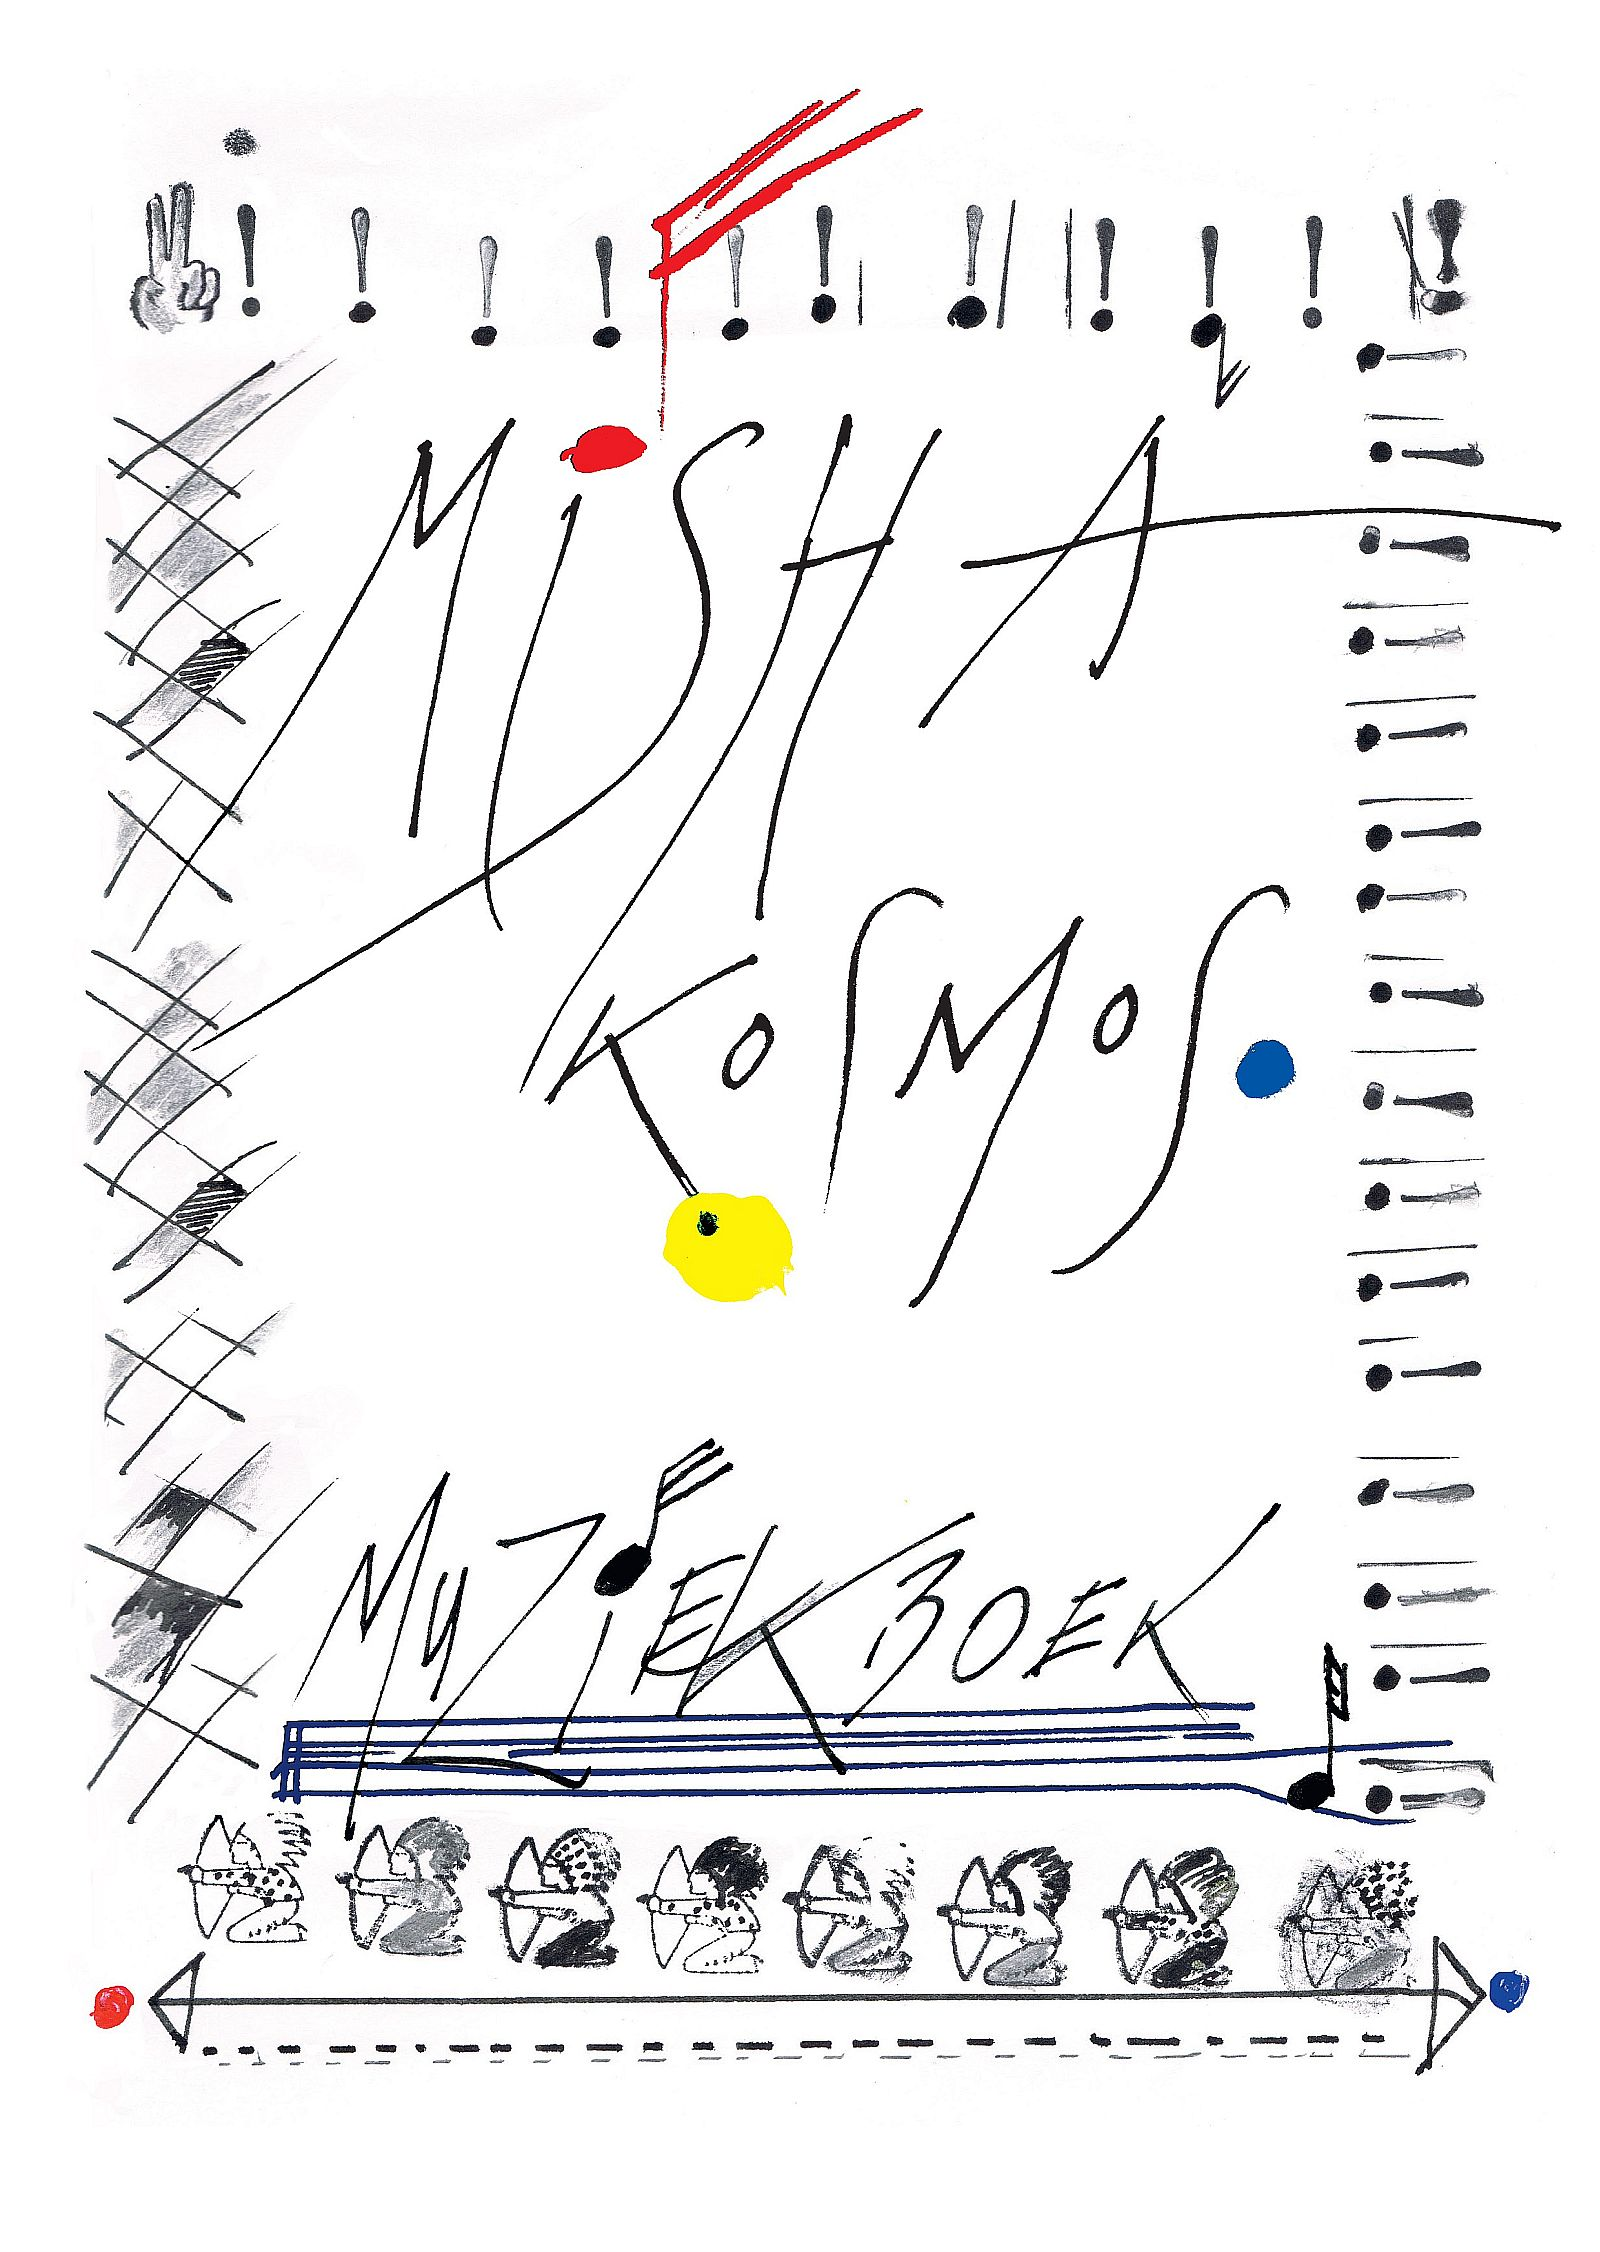 MishaKosmos 1600pix